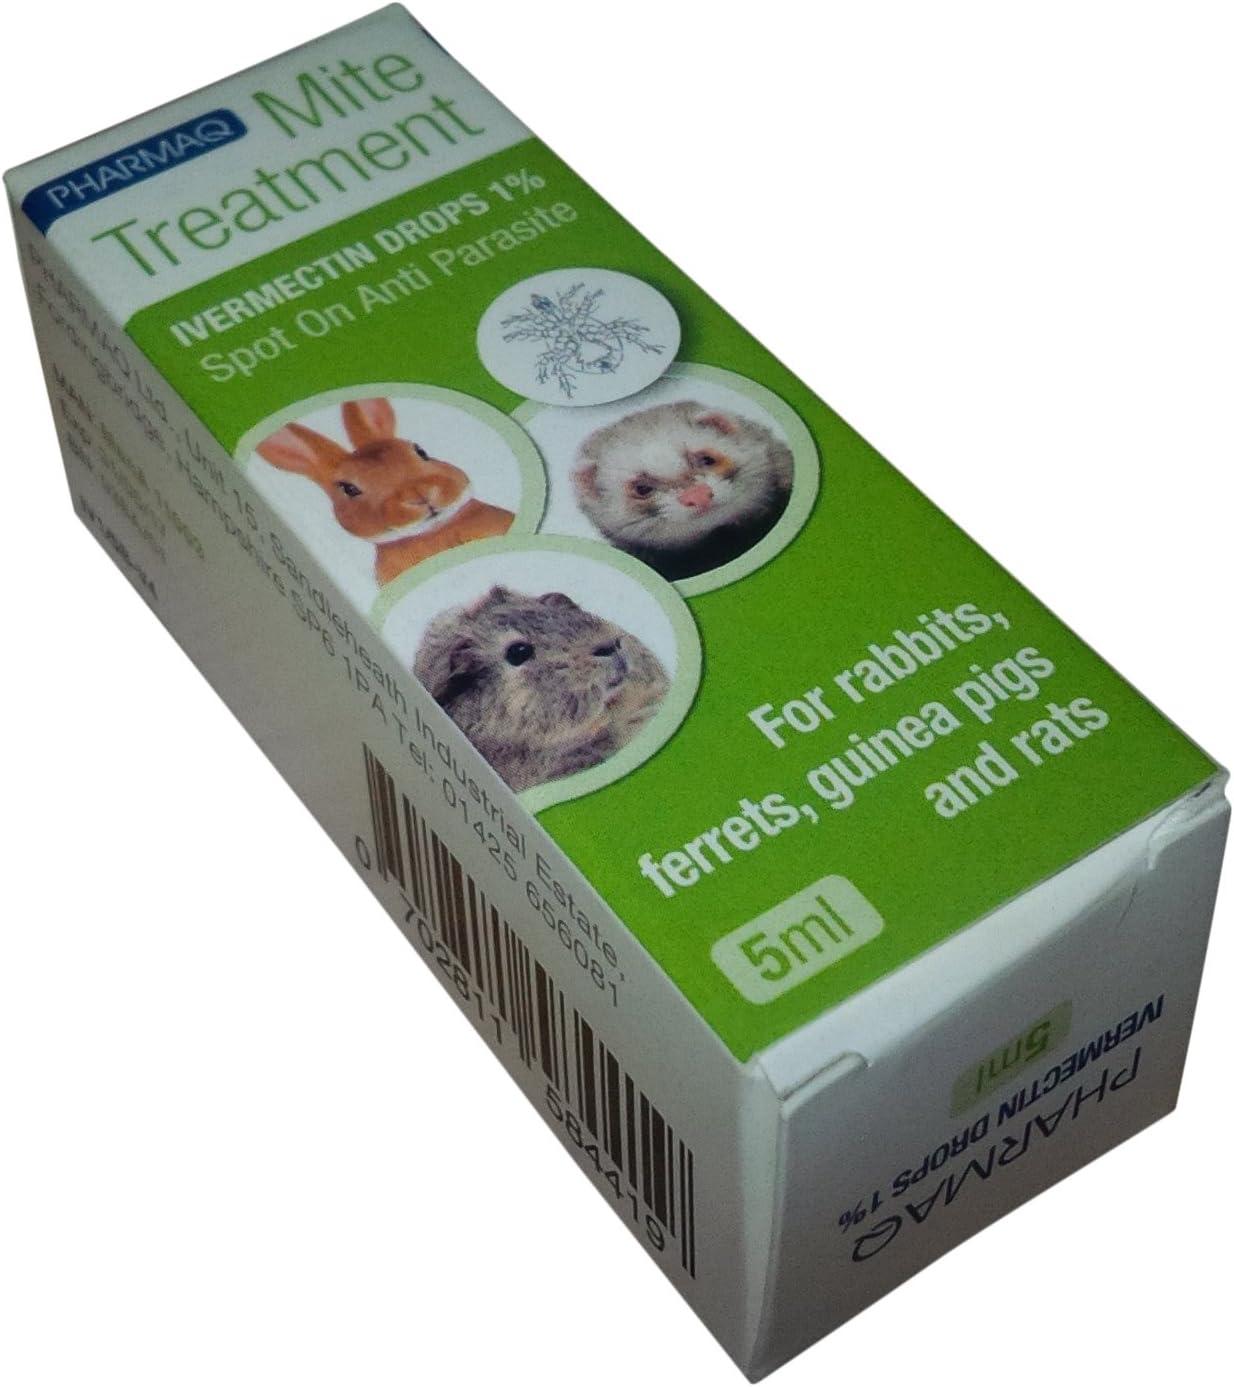 PHARMAQ - Gotas Ivermectina 1% 5ml–Tratamiento de los ácaros para Mascotas peludas pequeñas